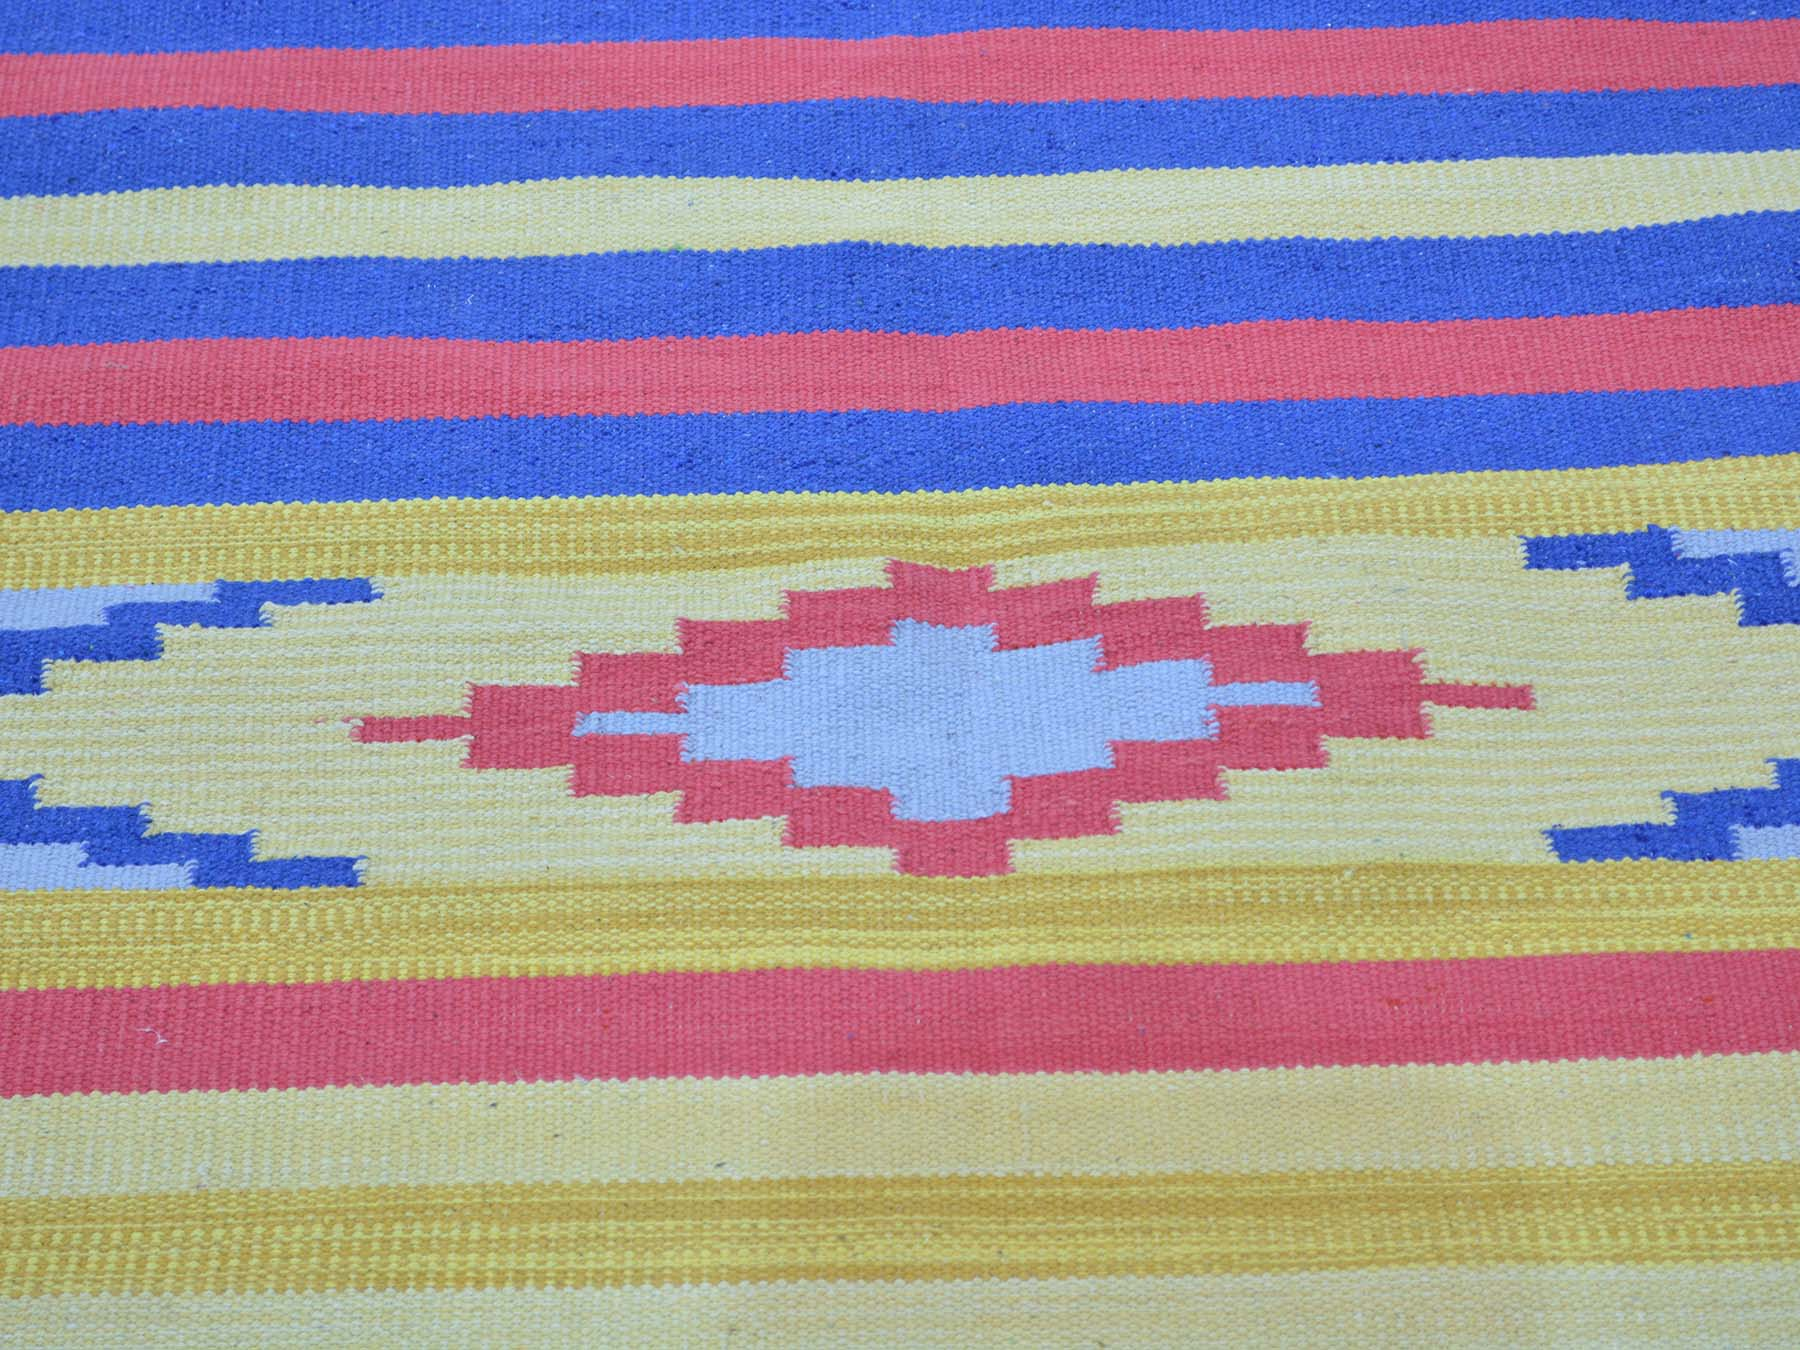 4-x6- Flat Weave Killim Hand Woven Oriental Navajo Design Rug